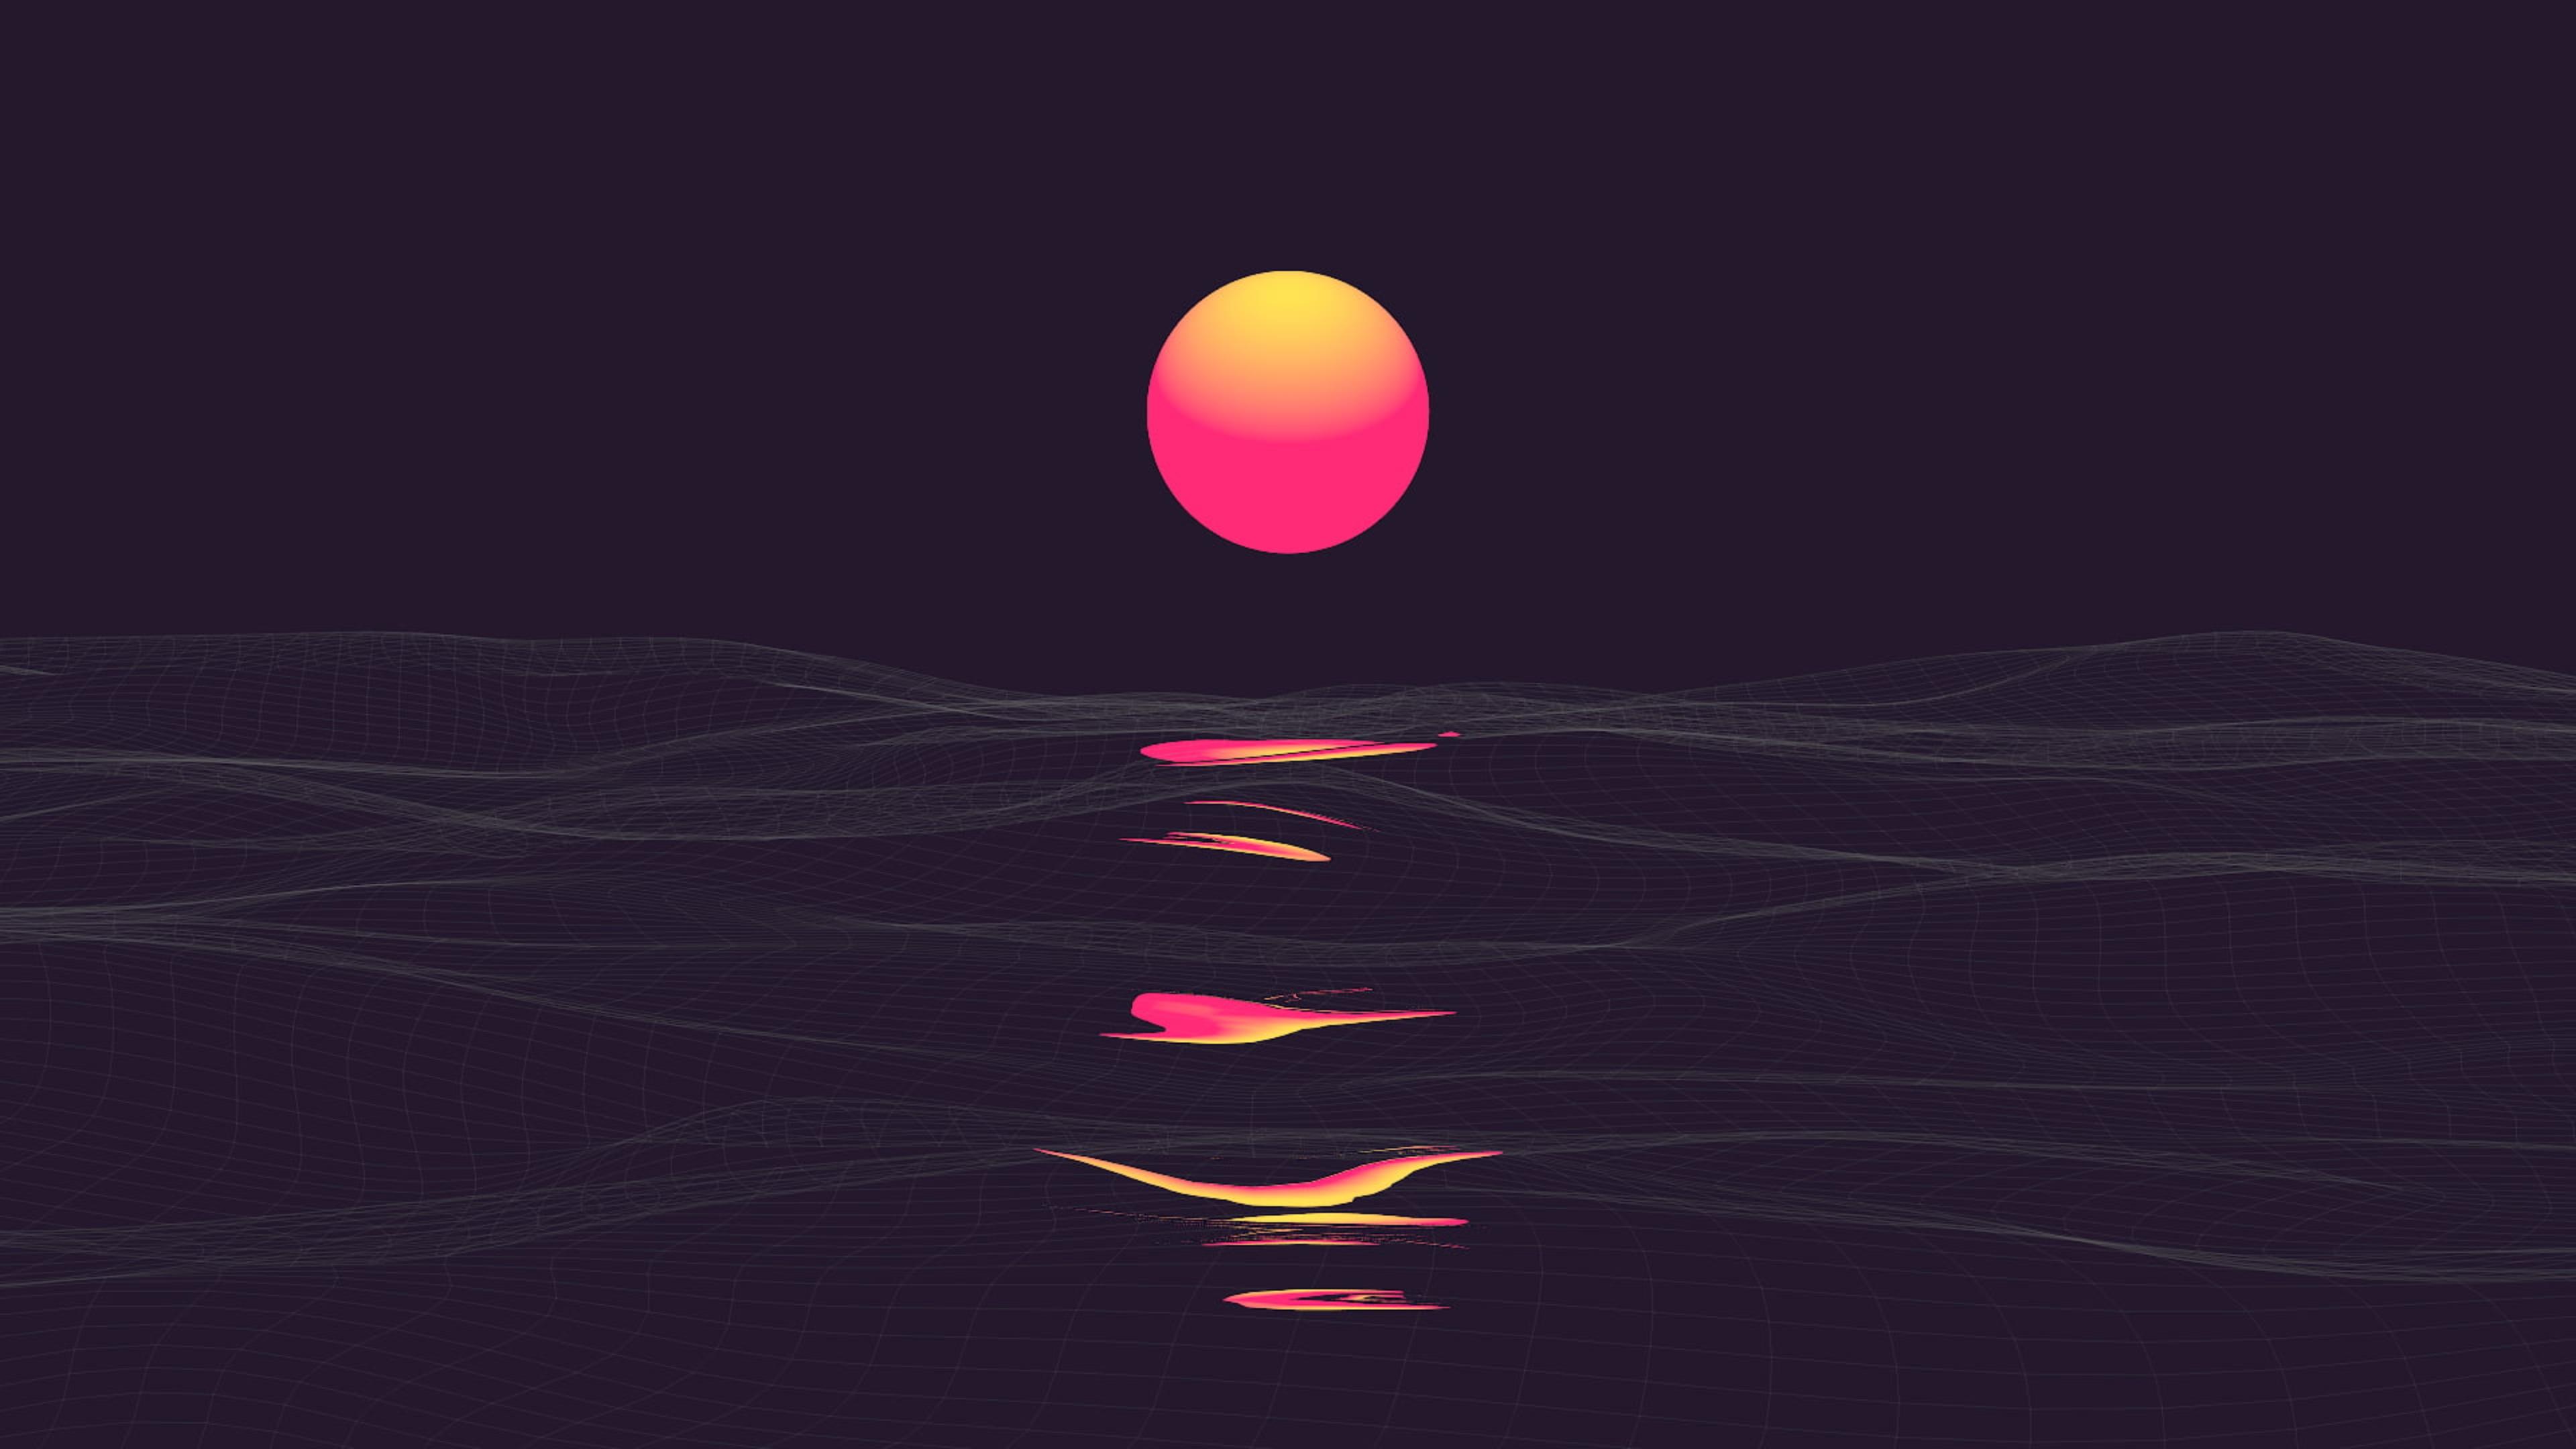 Orange and Red Sun Illustration 4K wallpaper 3840x2160